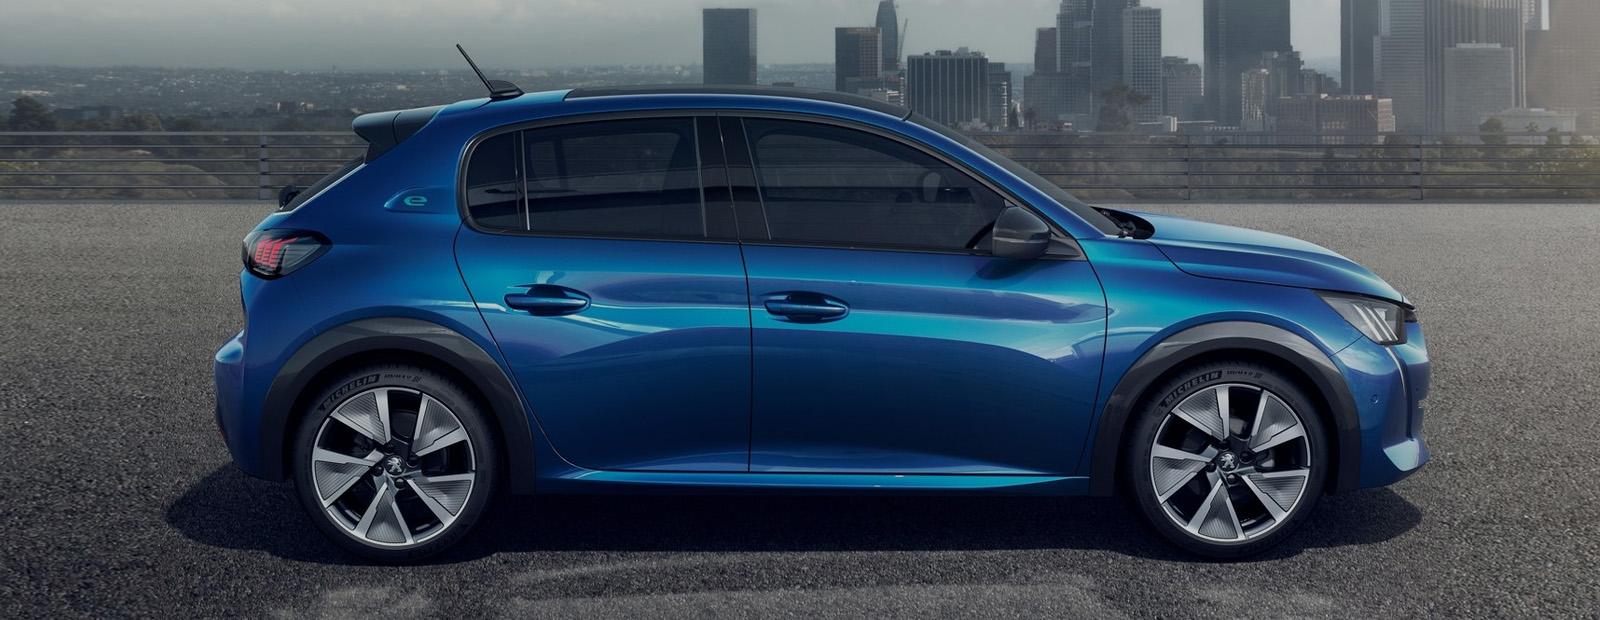 Impressie nieuwe Peugeot e208